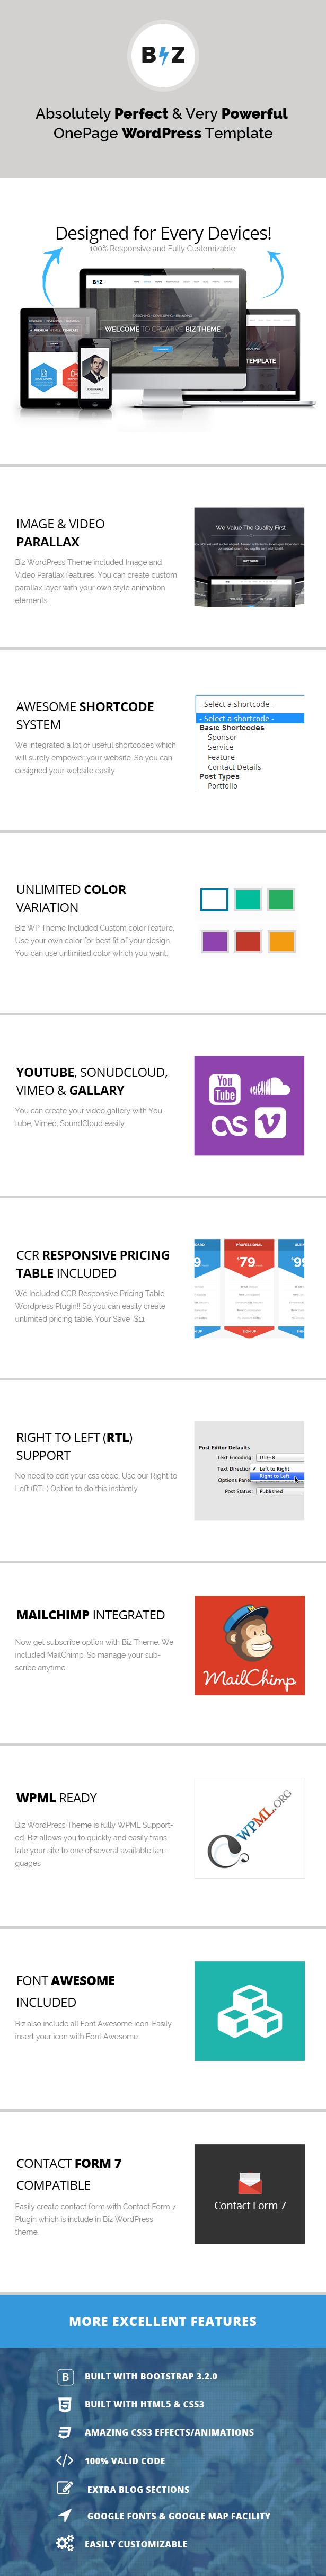 WordPress theme Biz - Multipurpose Business and Corporate Theme (Business)